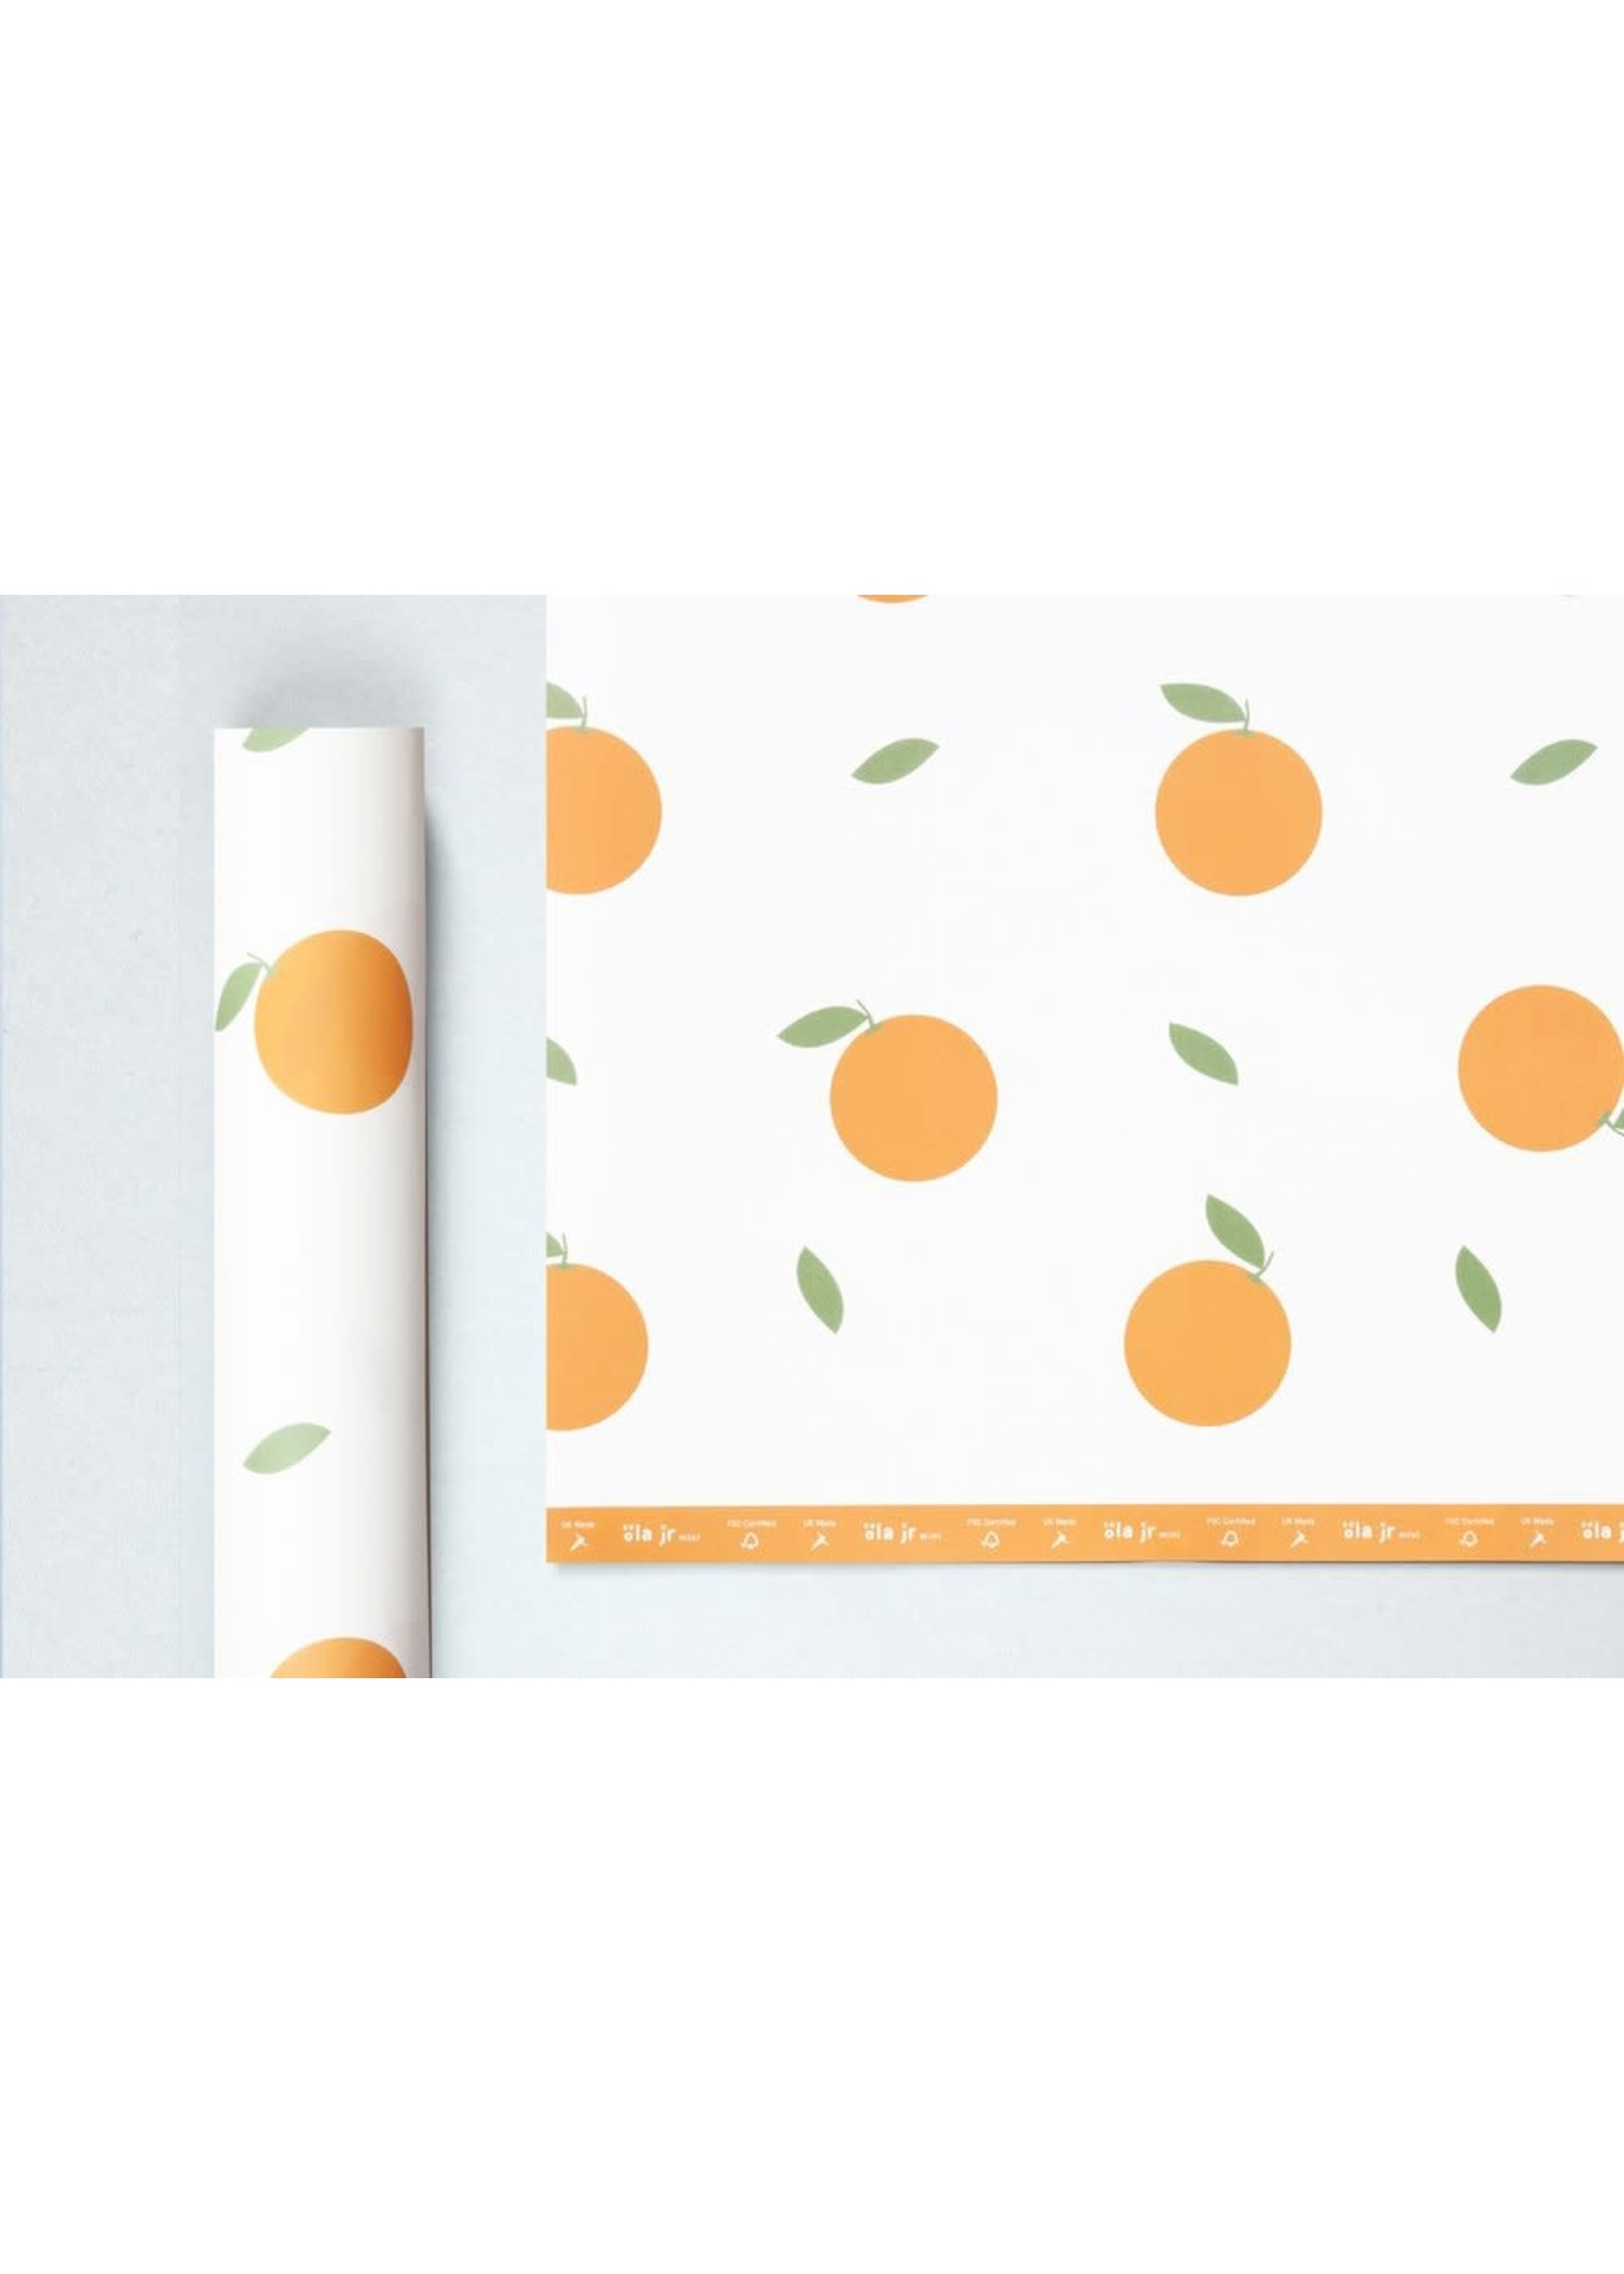 Ola ola jr mini Patterned Papers, Oranges Print